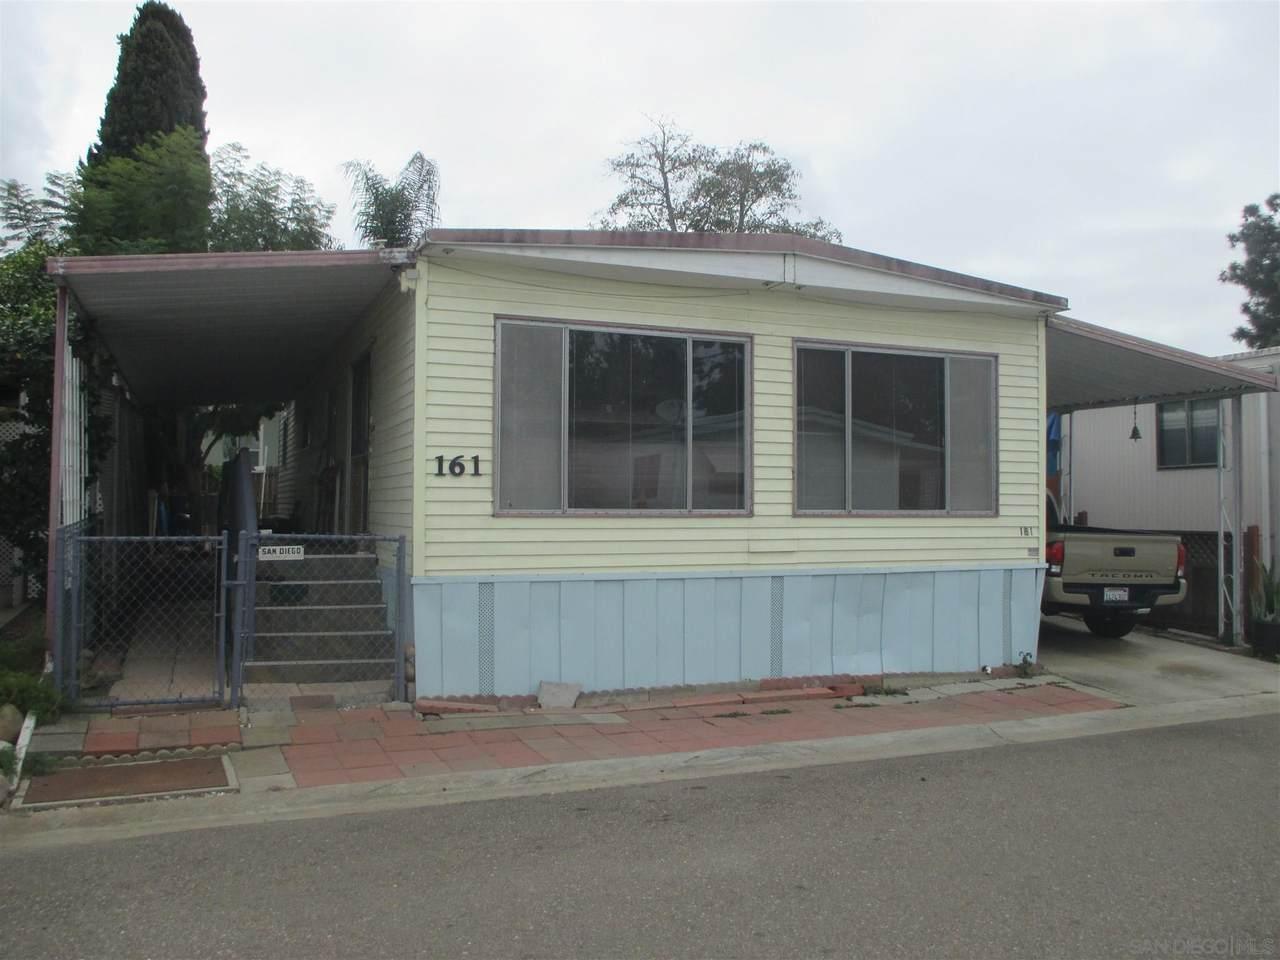 2750 Wheatstone Street Spc 161 - Photo 1